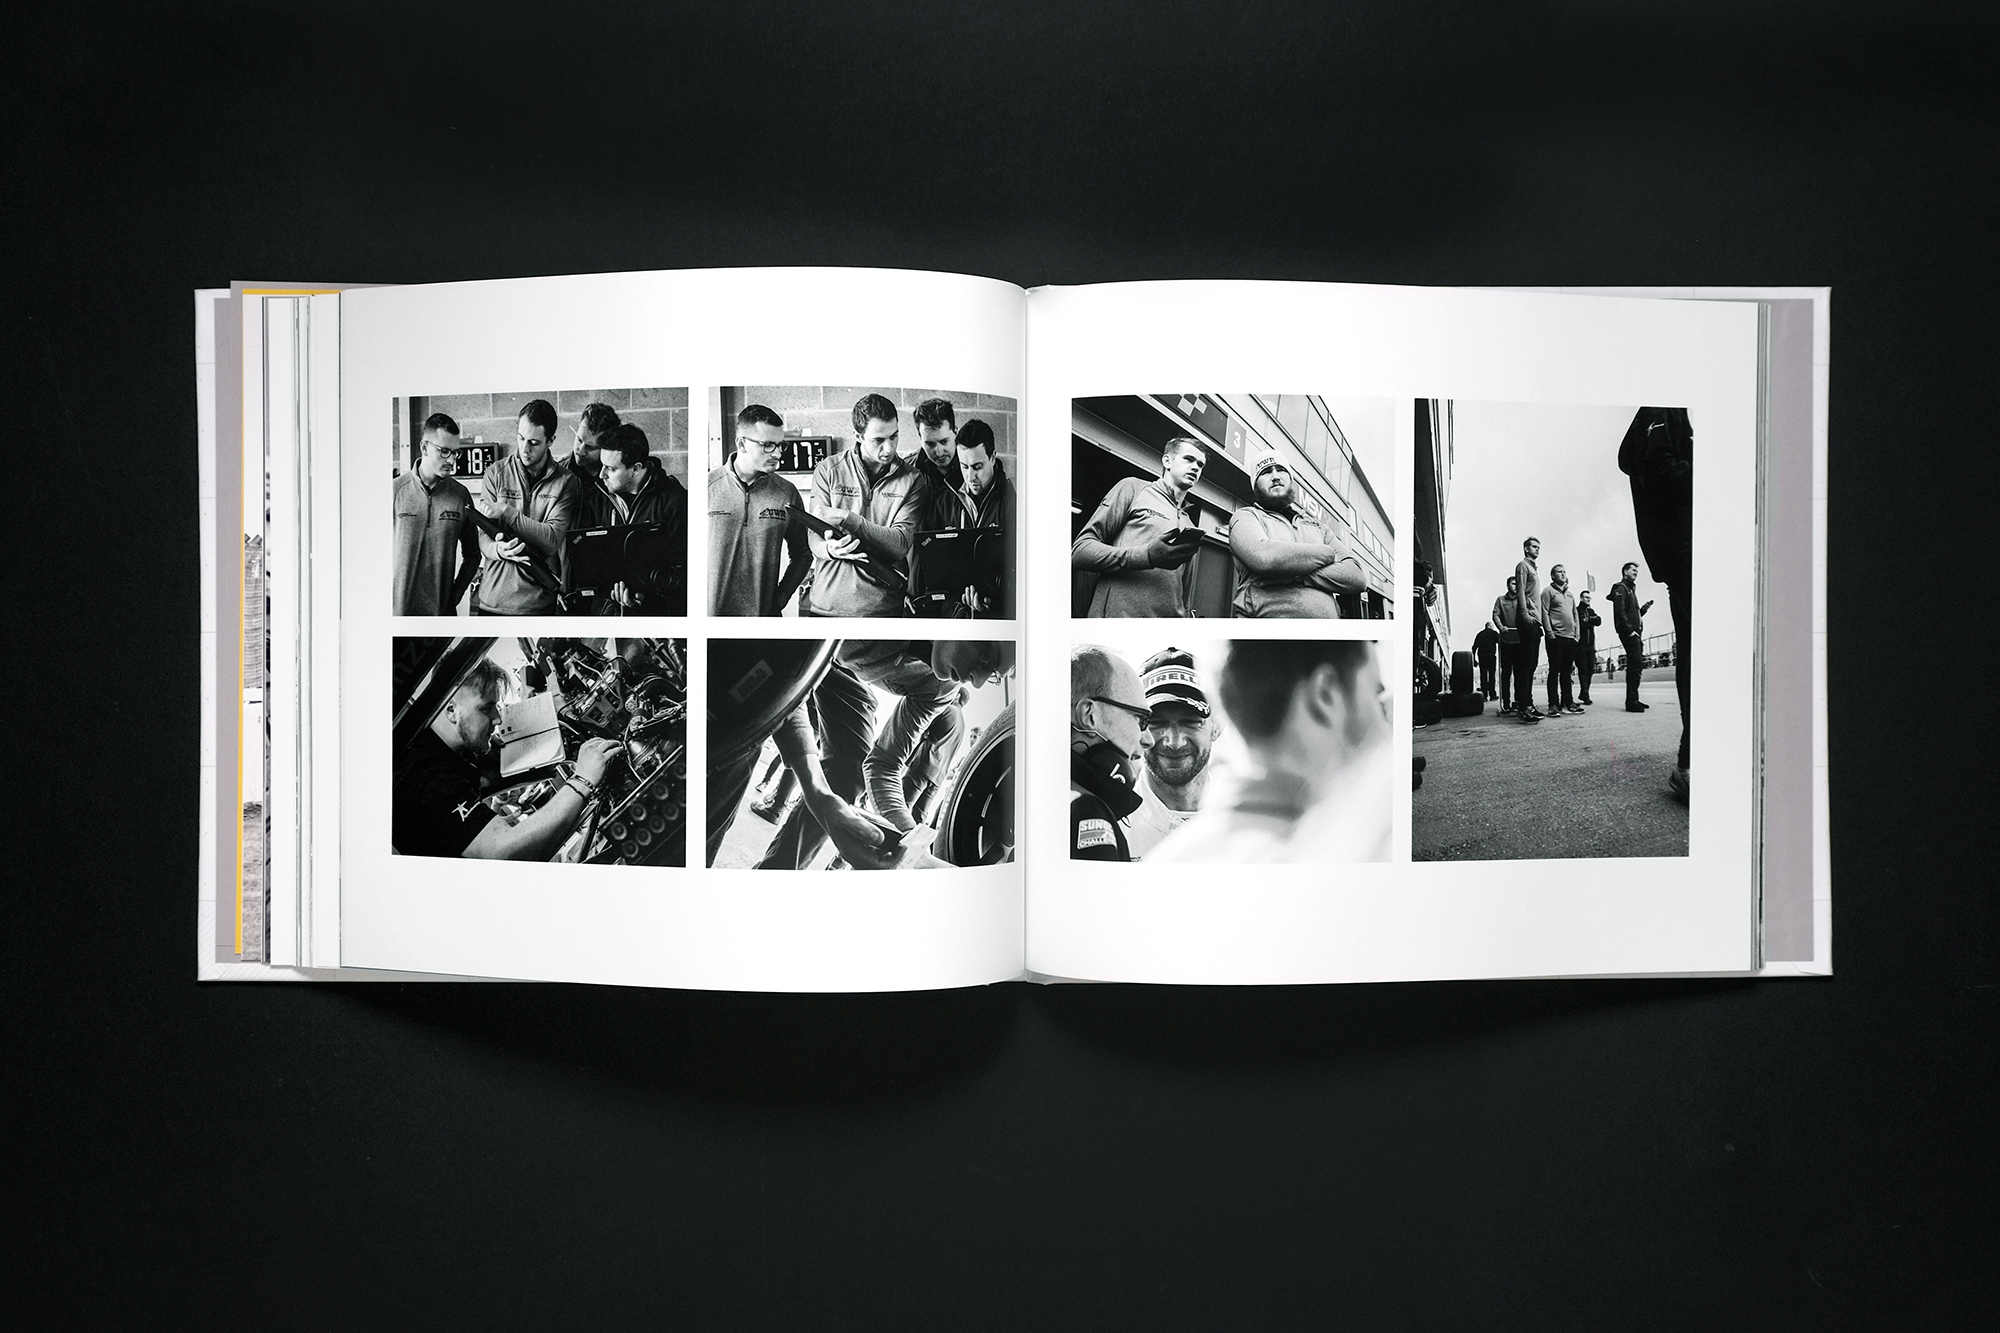 http://rusyndesign.co.uk/wp-content/uploads/2020/04/UWR-19-book-shots-14.jpg